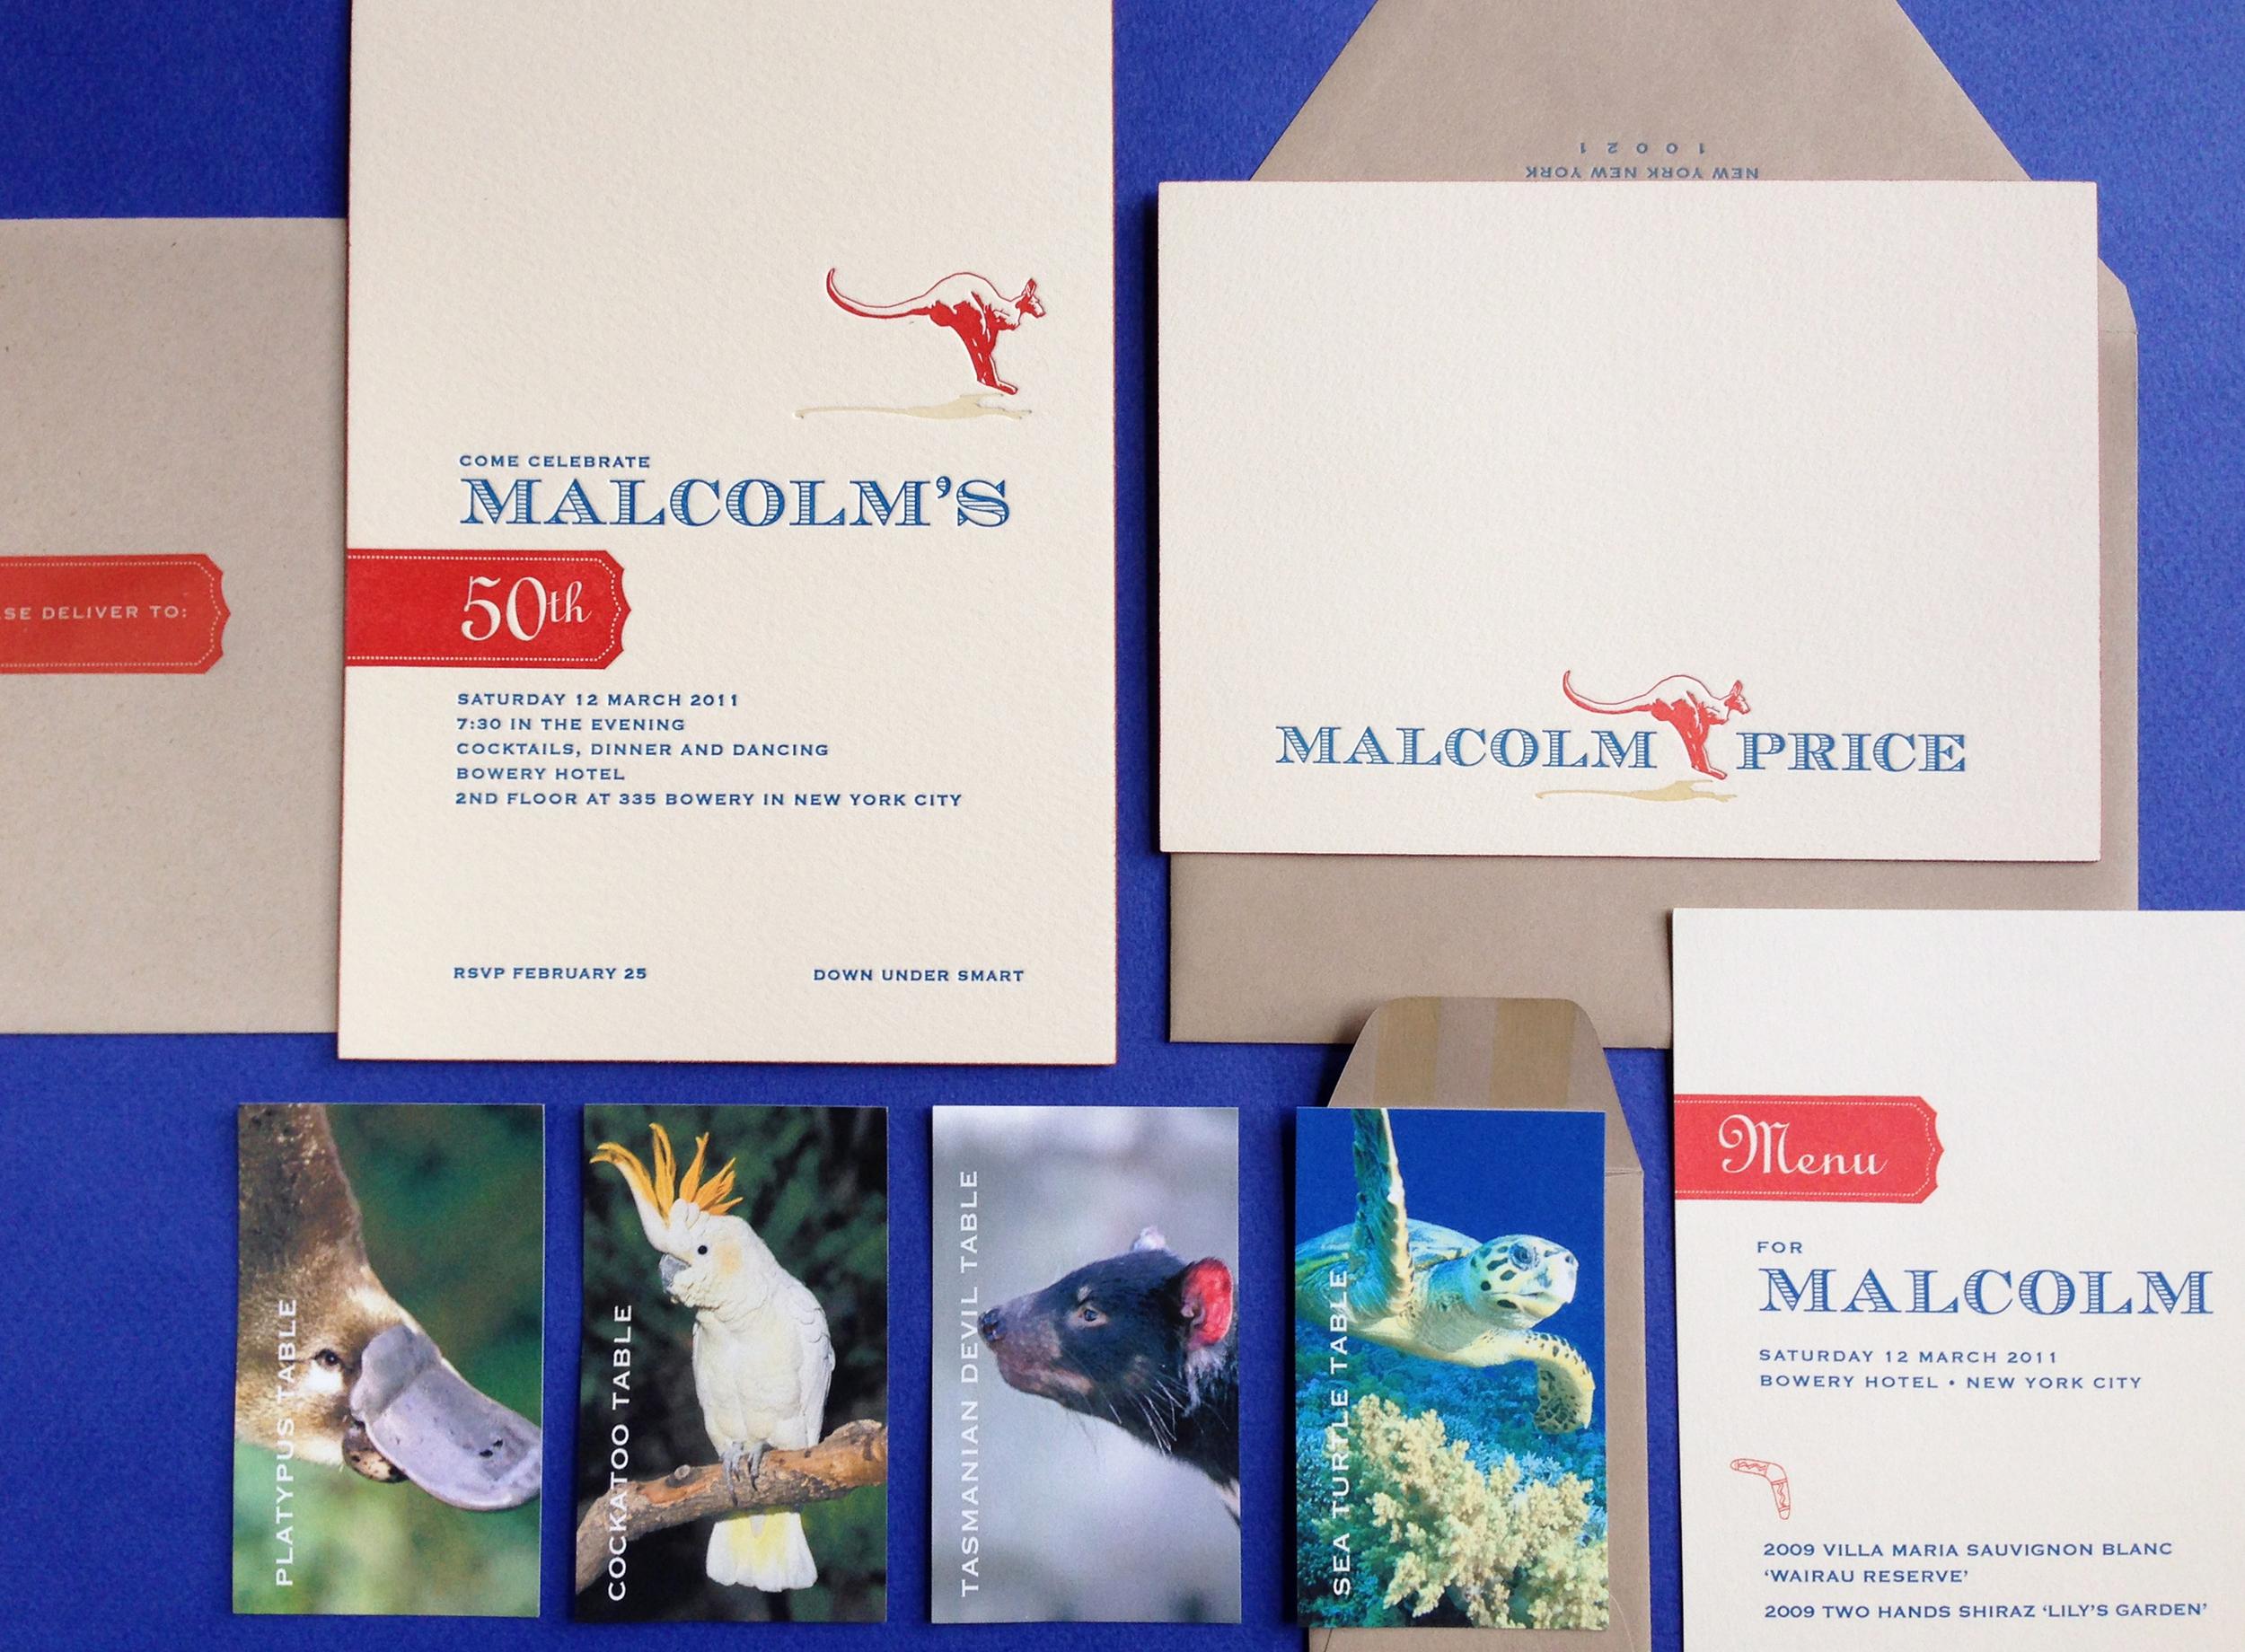 malcolm bday 1 address edit.jpg